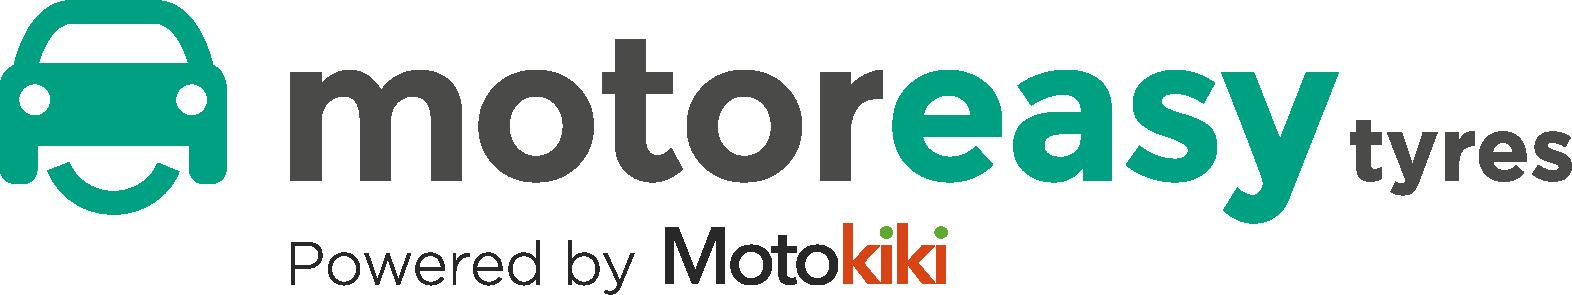 MotorEasy Tyres